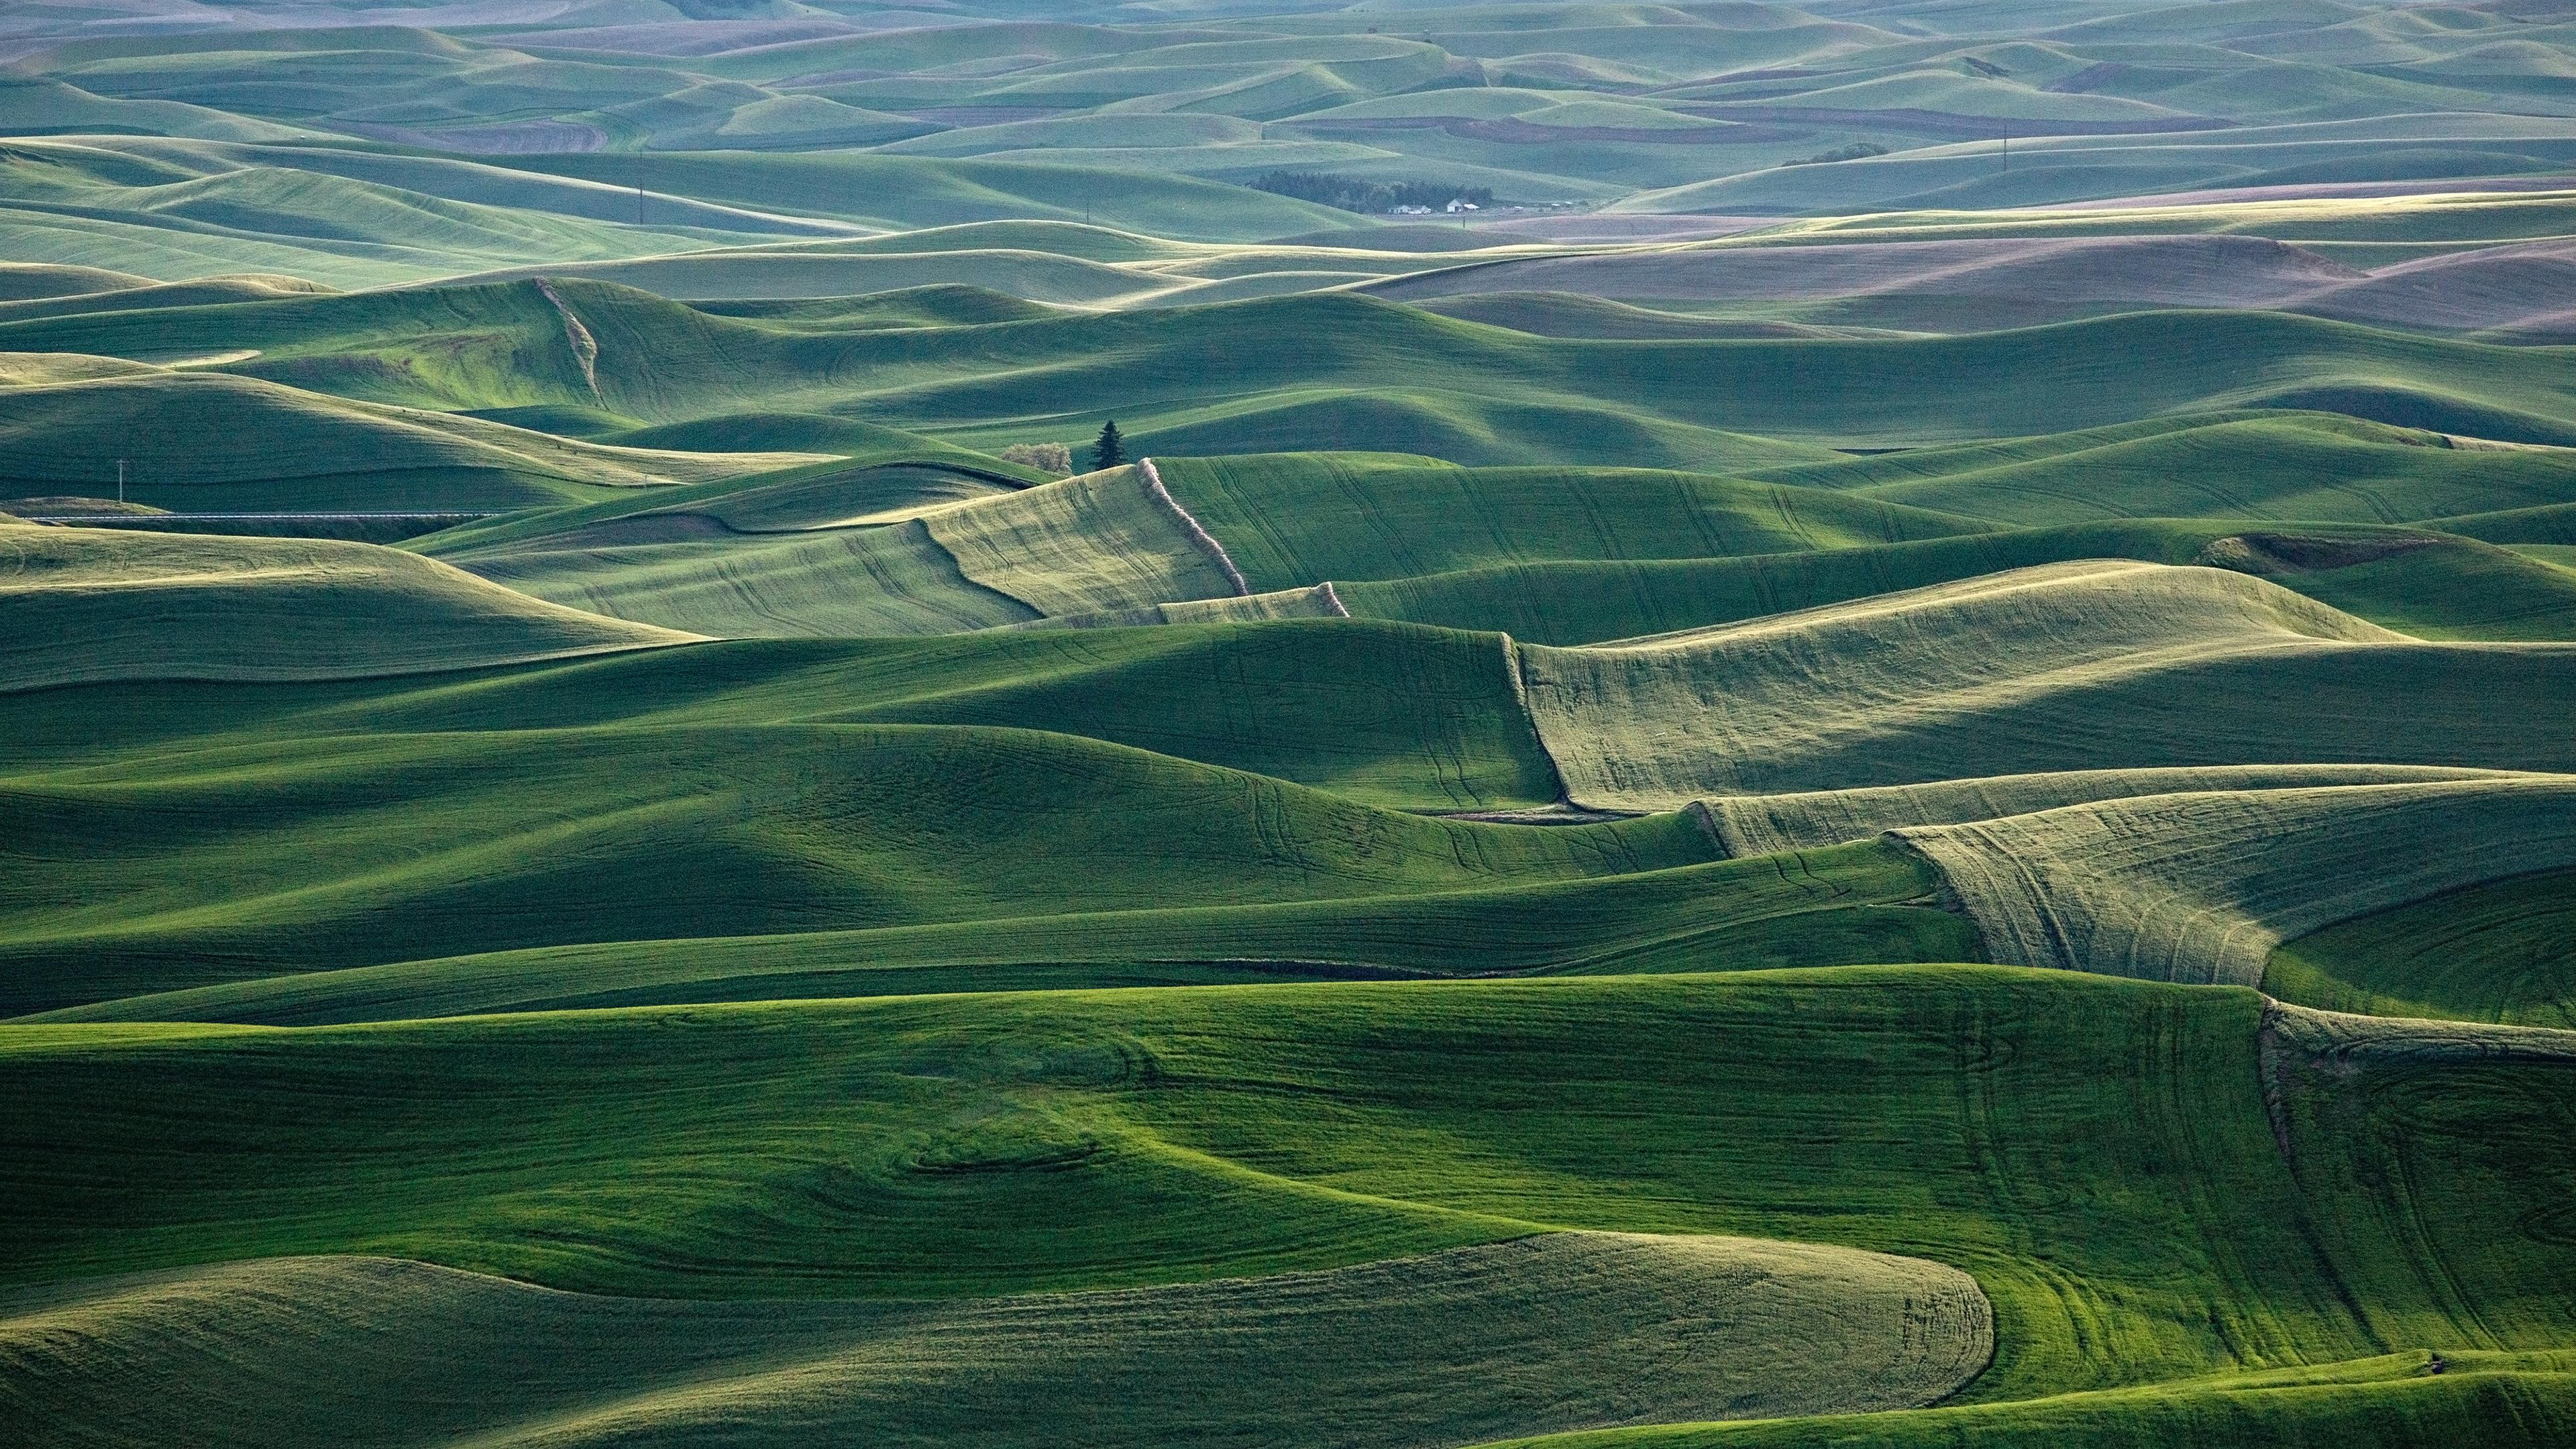 Windows 10 wallpaper 3200x1800 wallpapersafari for 1800 x 1200 window